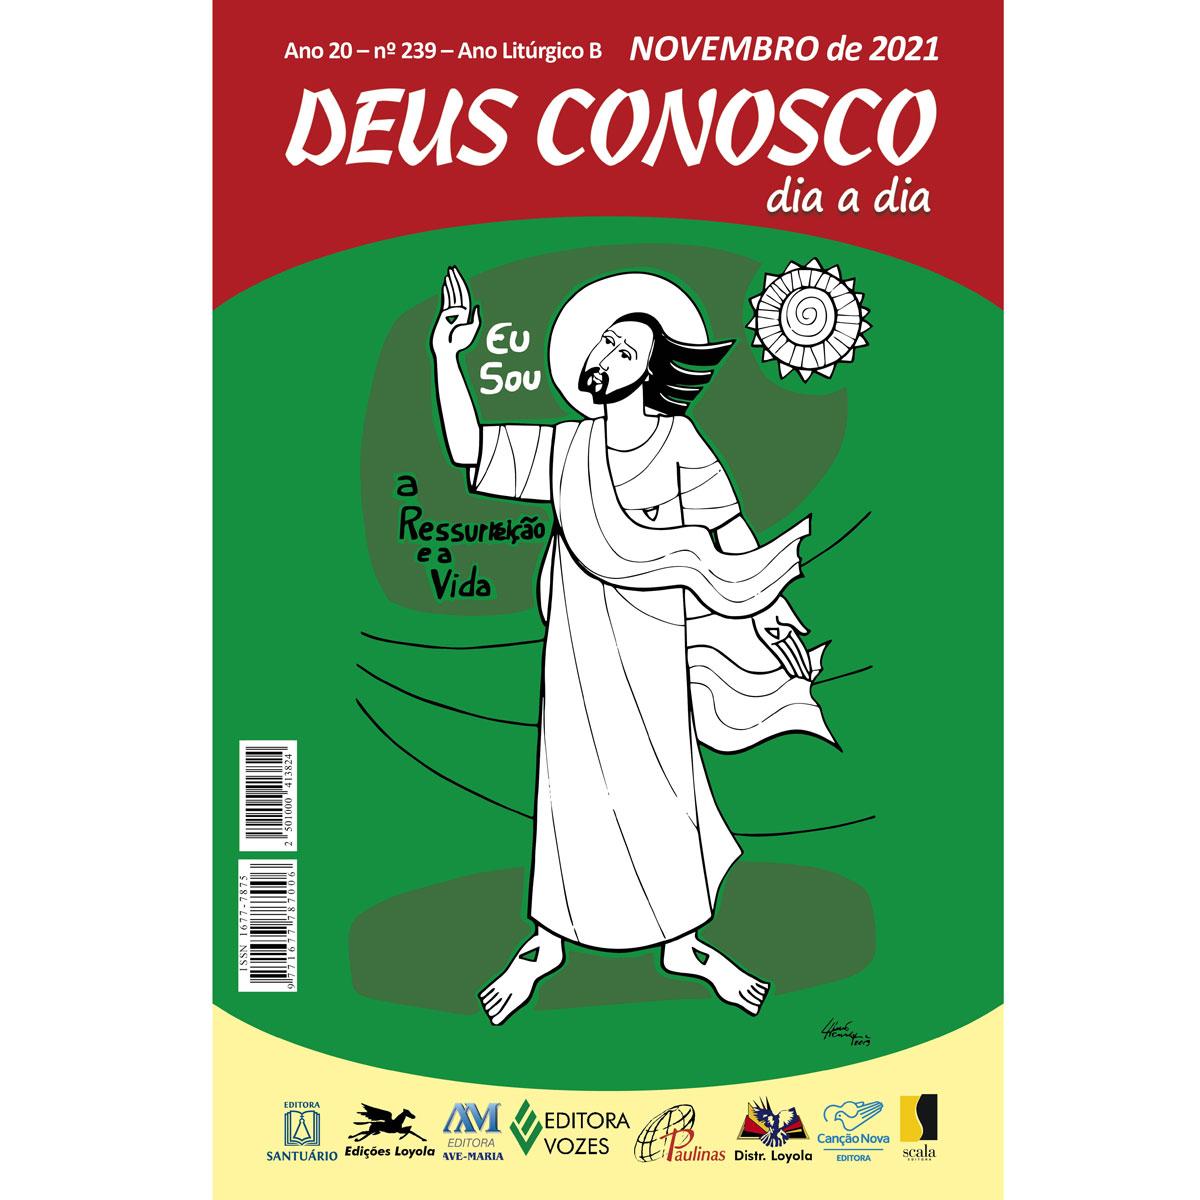 Deus Conosco - Novembro 2021  - VindVedShop - Distribuidora Catolica